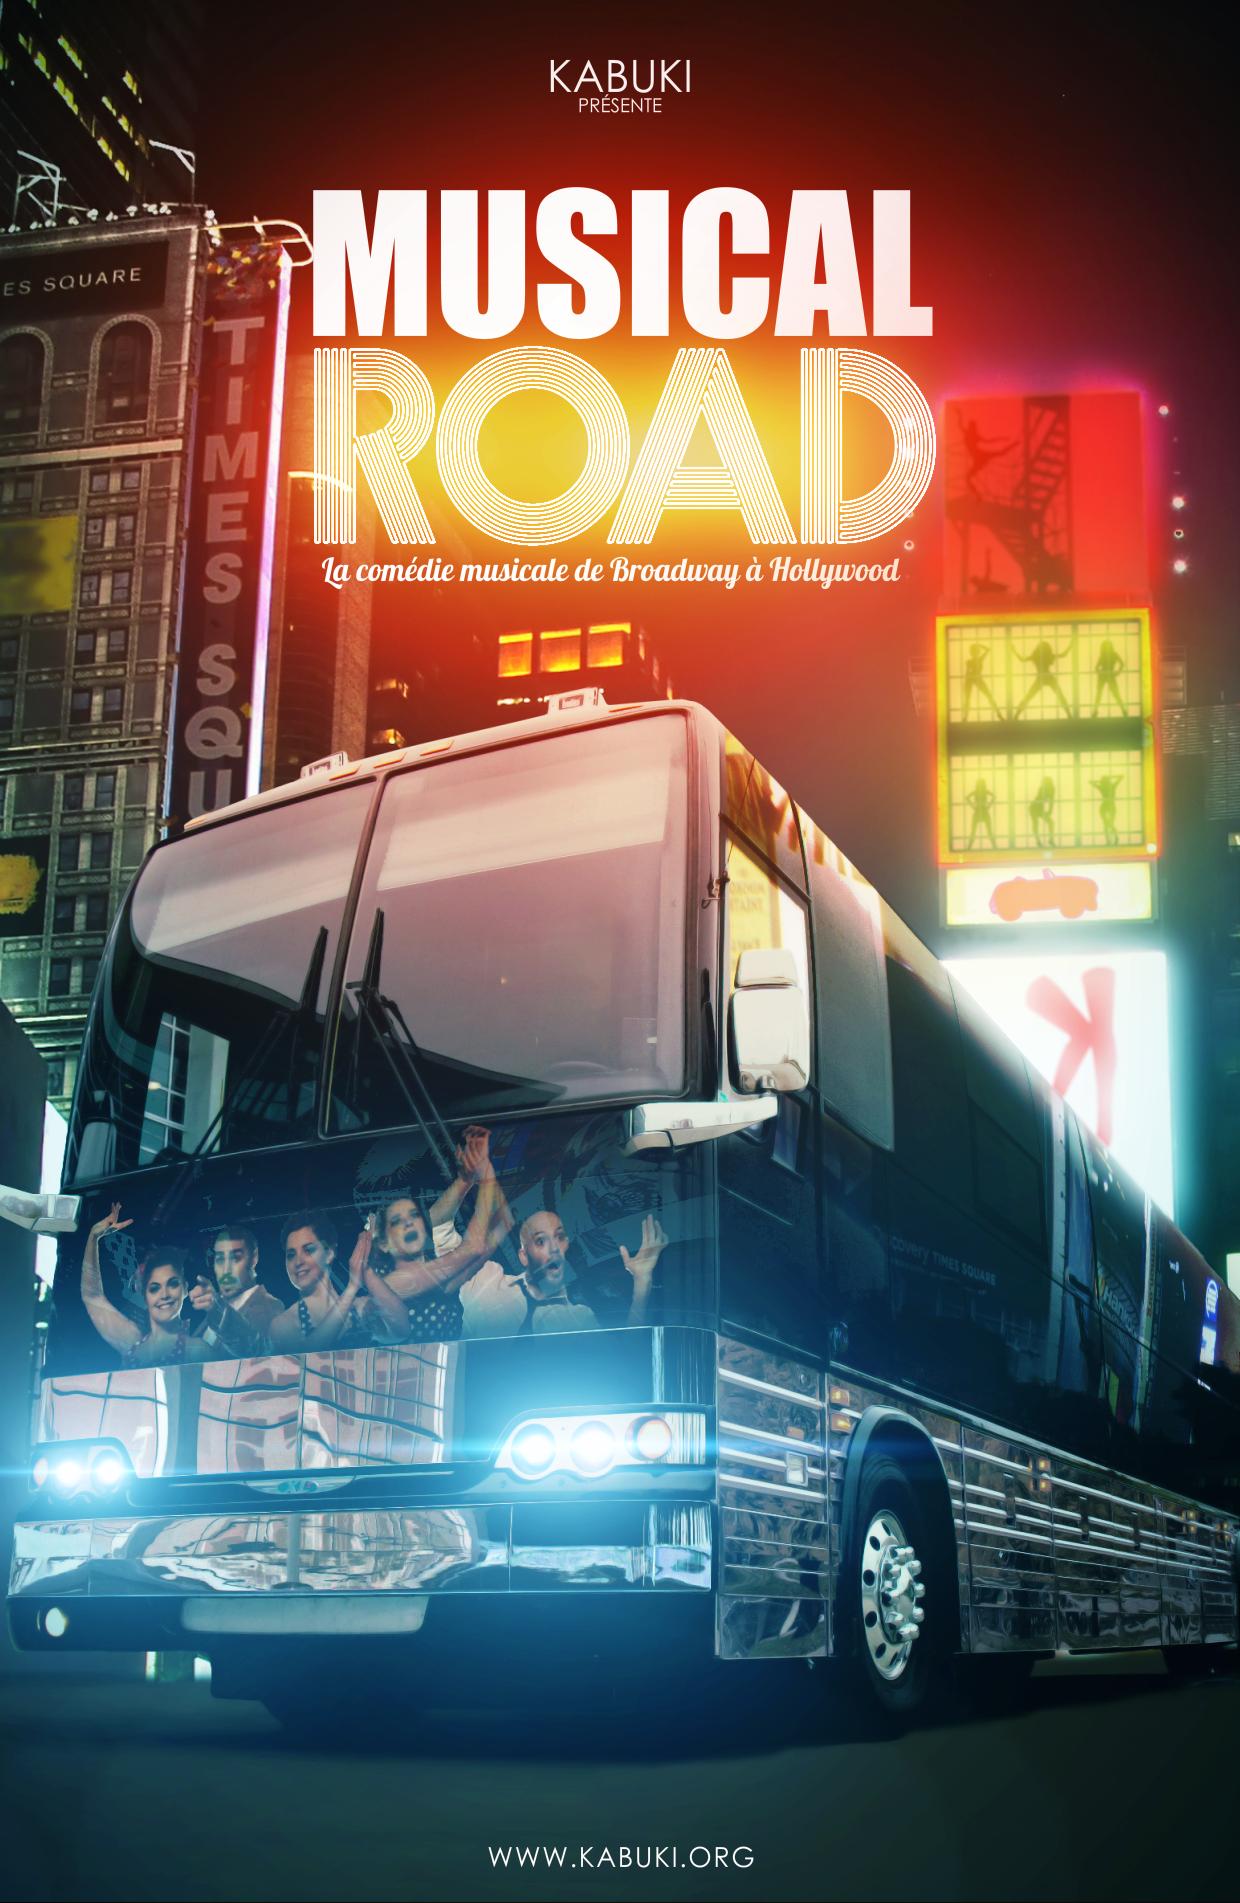 Musical Road - Affiche officielle